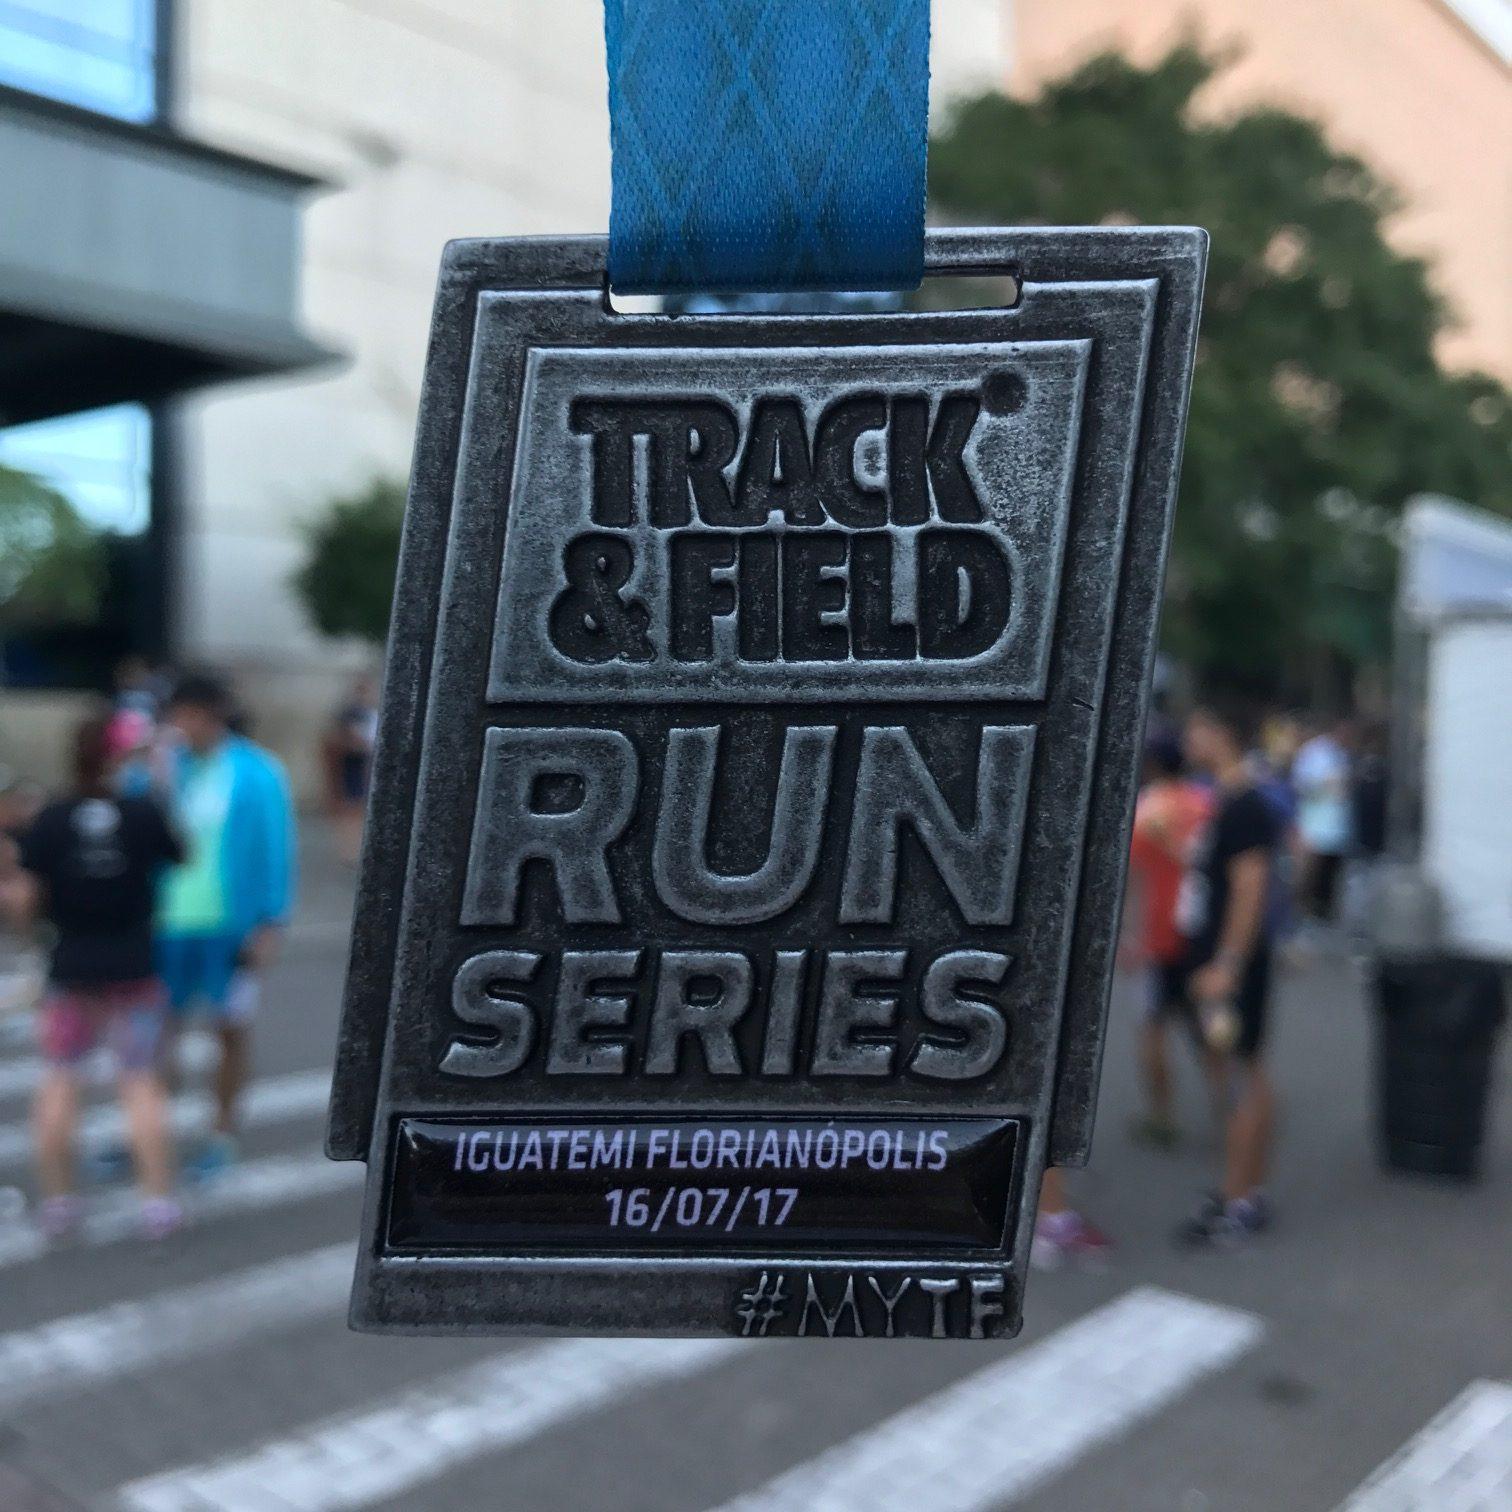 Track&Field Run Series Iguatemi Florianópolis – 16/07/2017